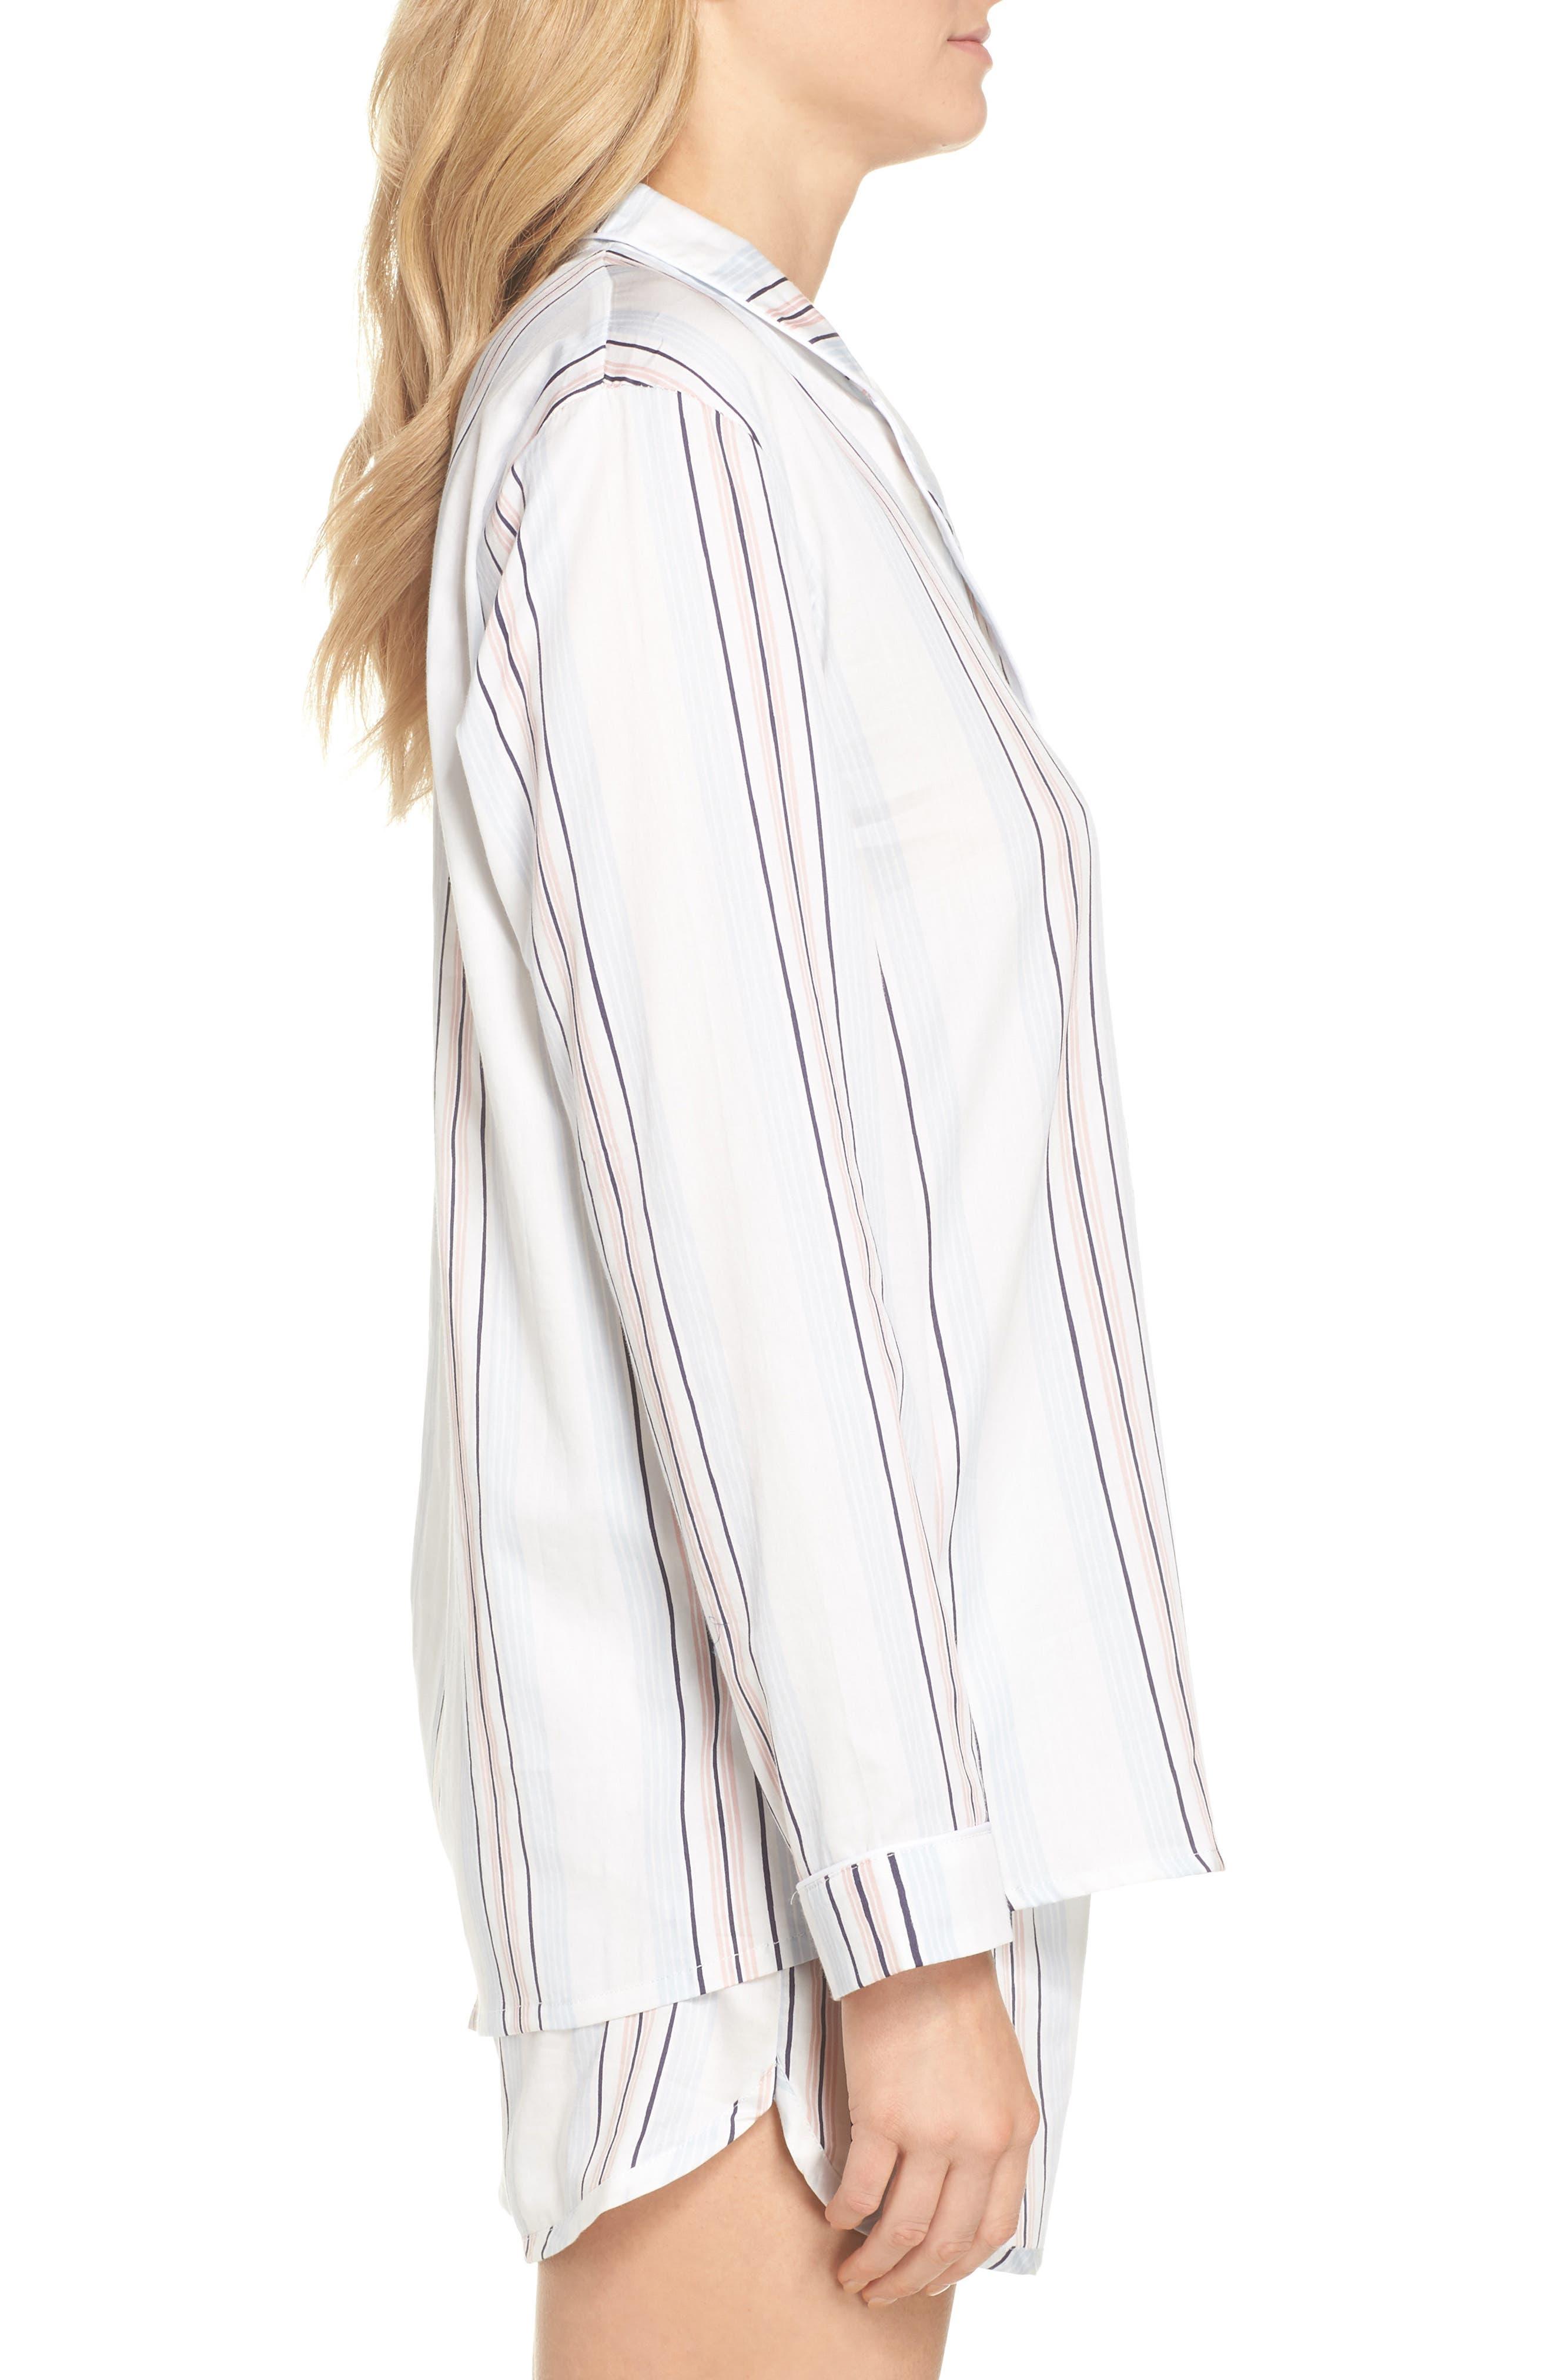 Candy Stripe Short Pajamas,                             Alternate thumbnail 3, color,                             110